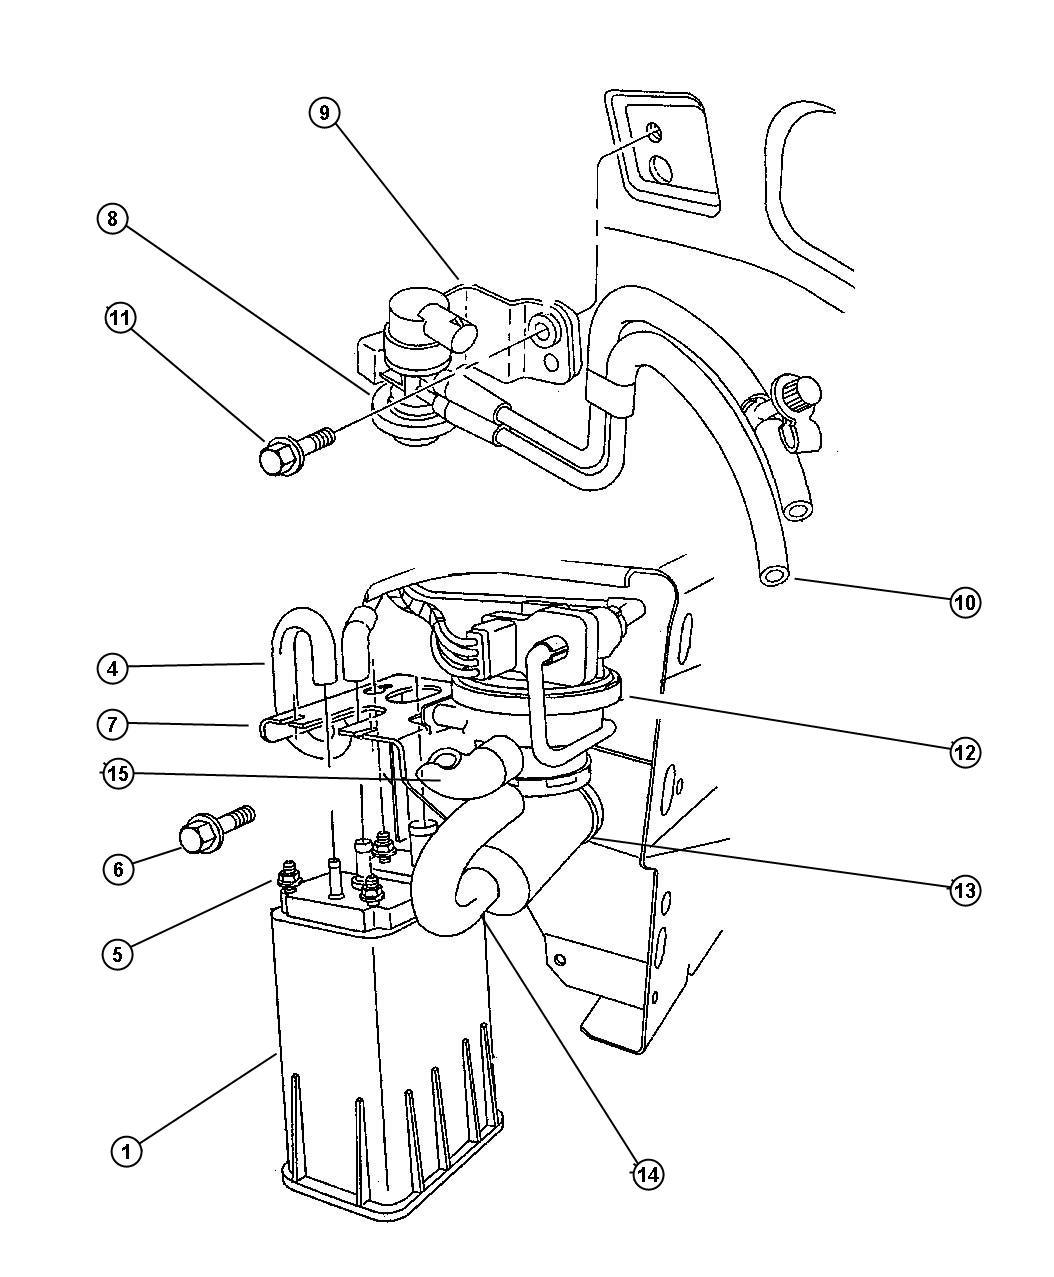 Chrysler Sebring Jxi Convertible Vapor Canister And